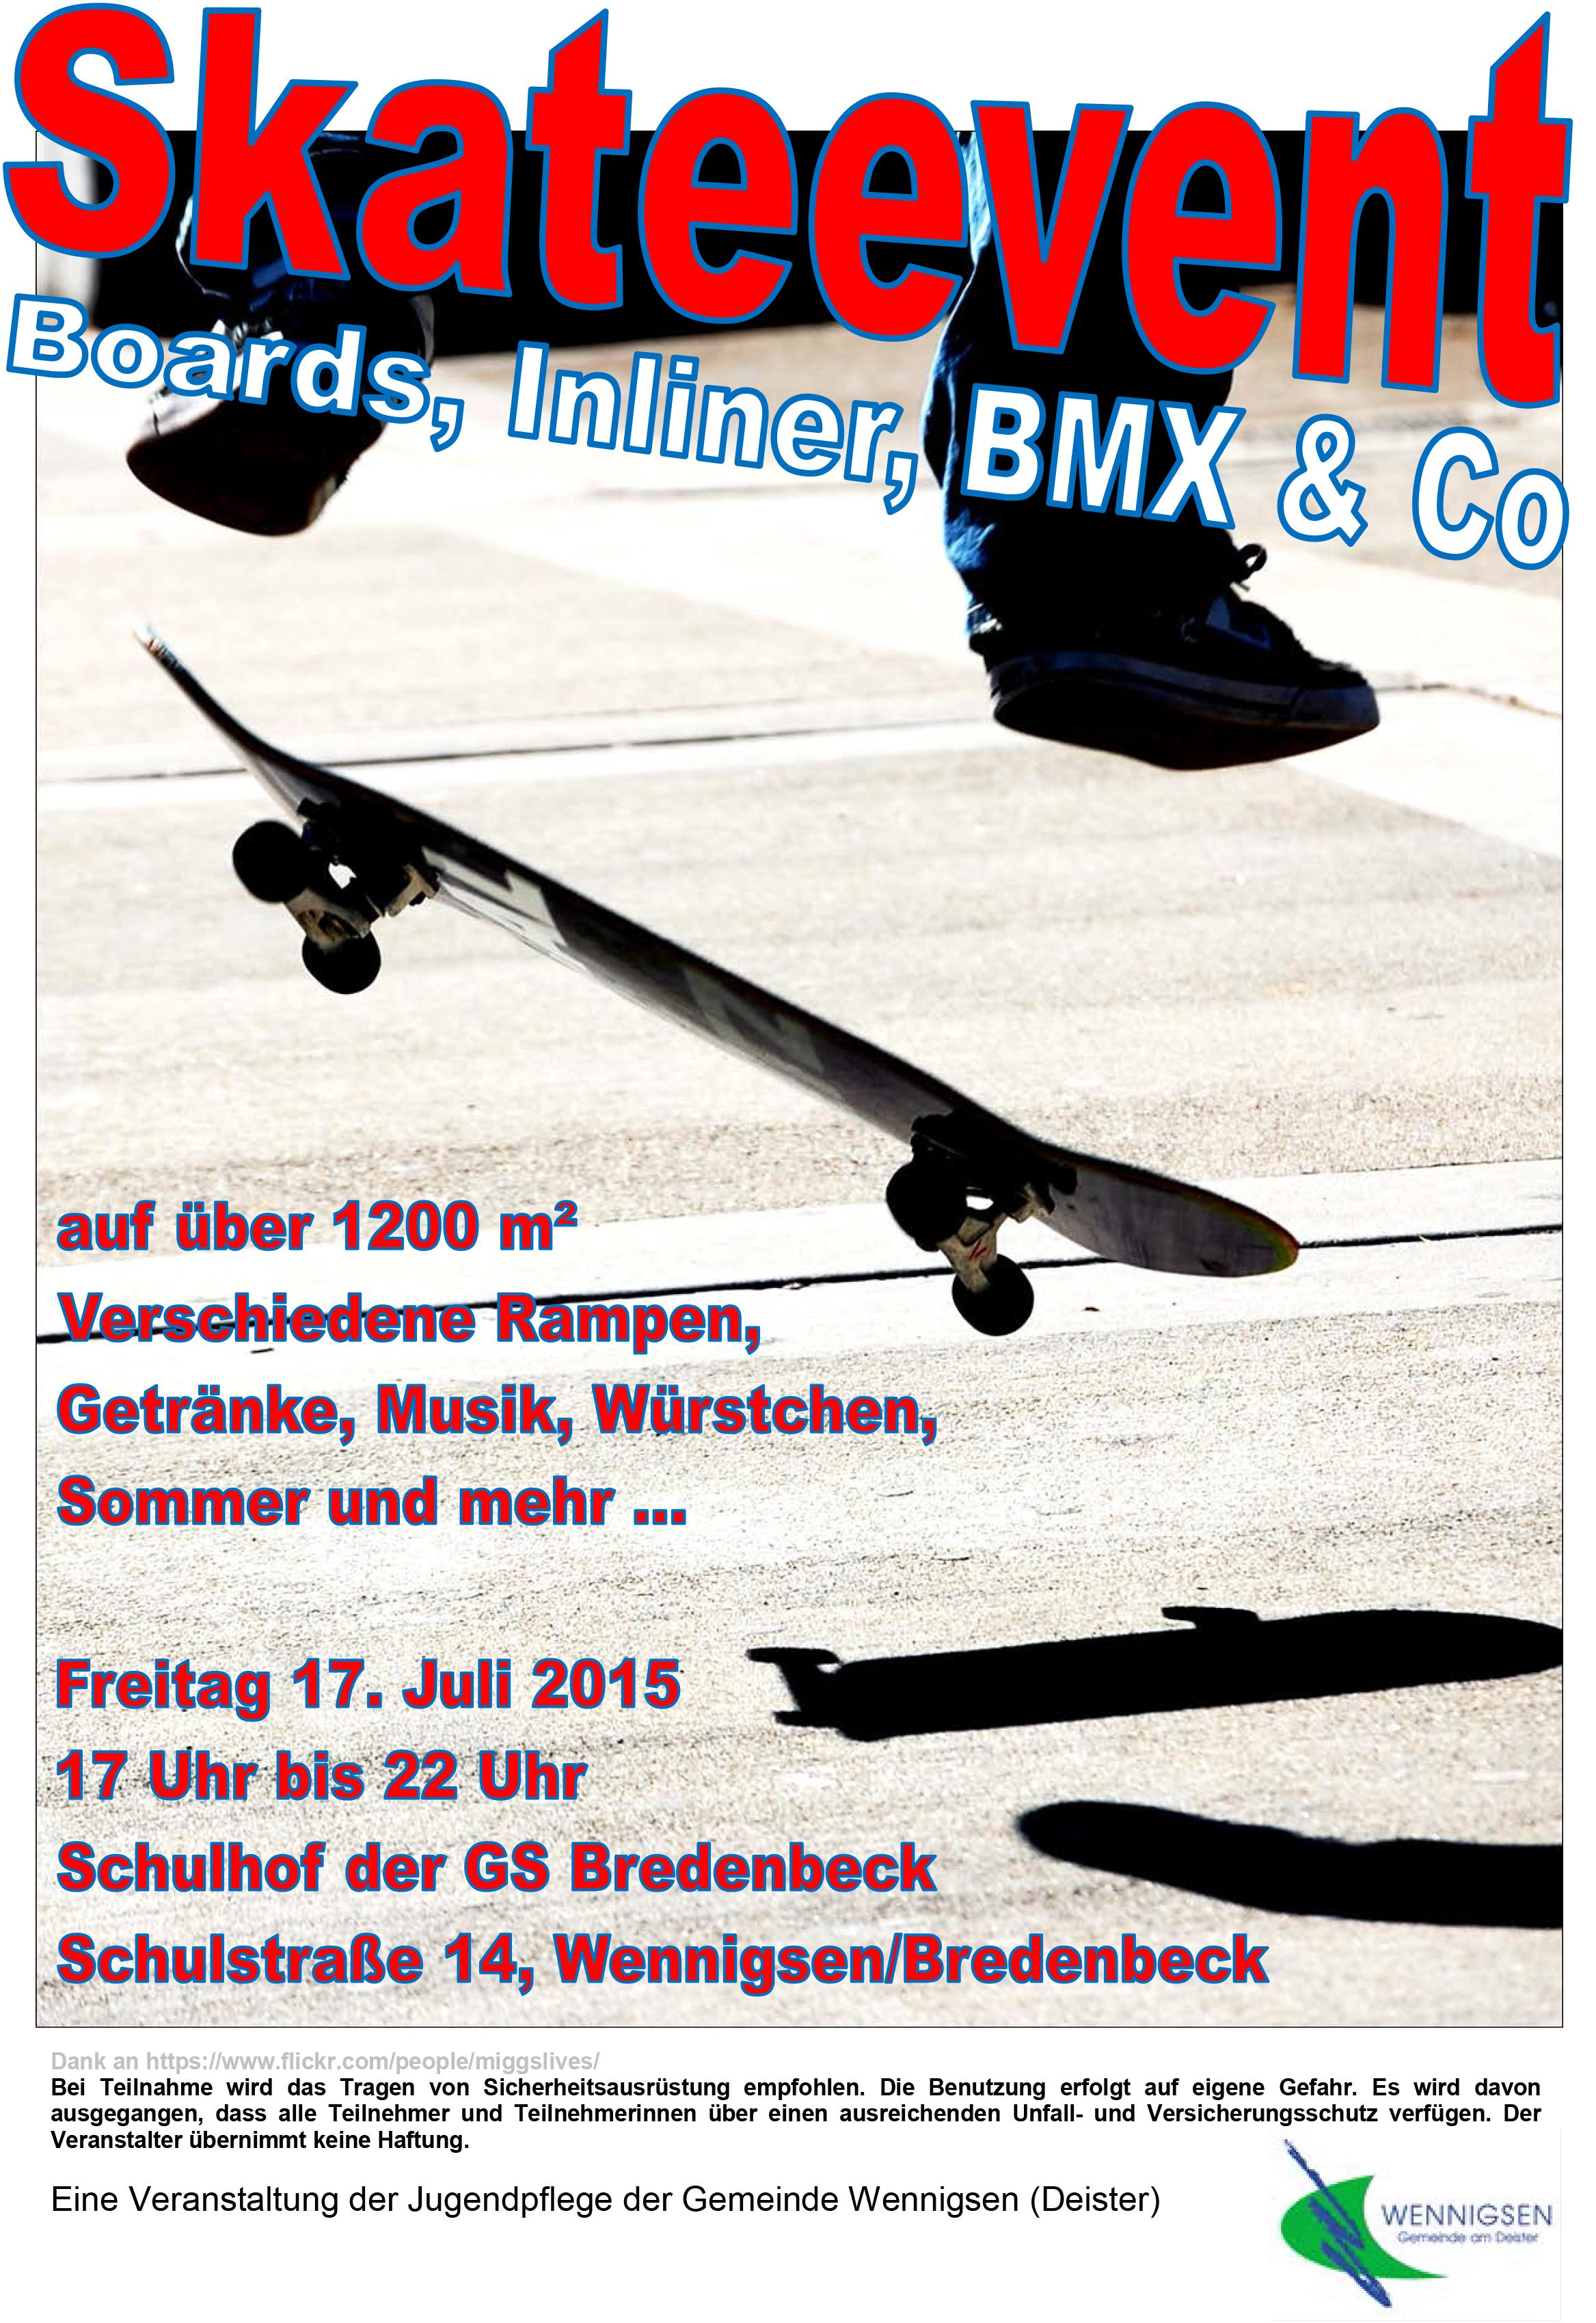 Skateevent 2015